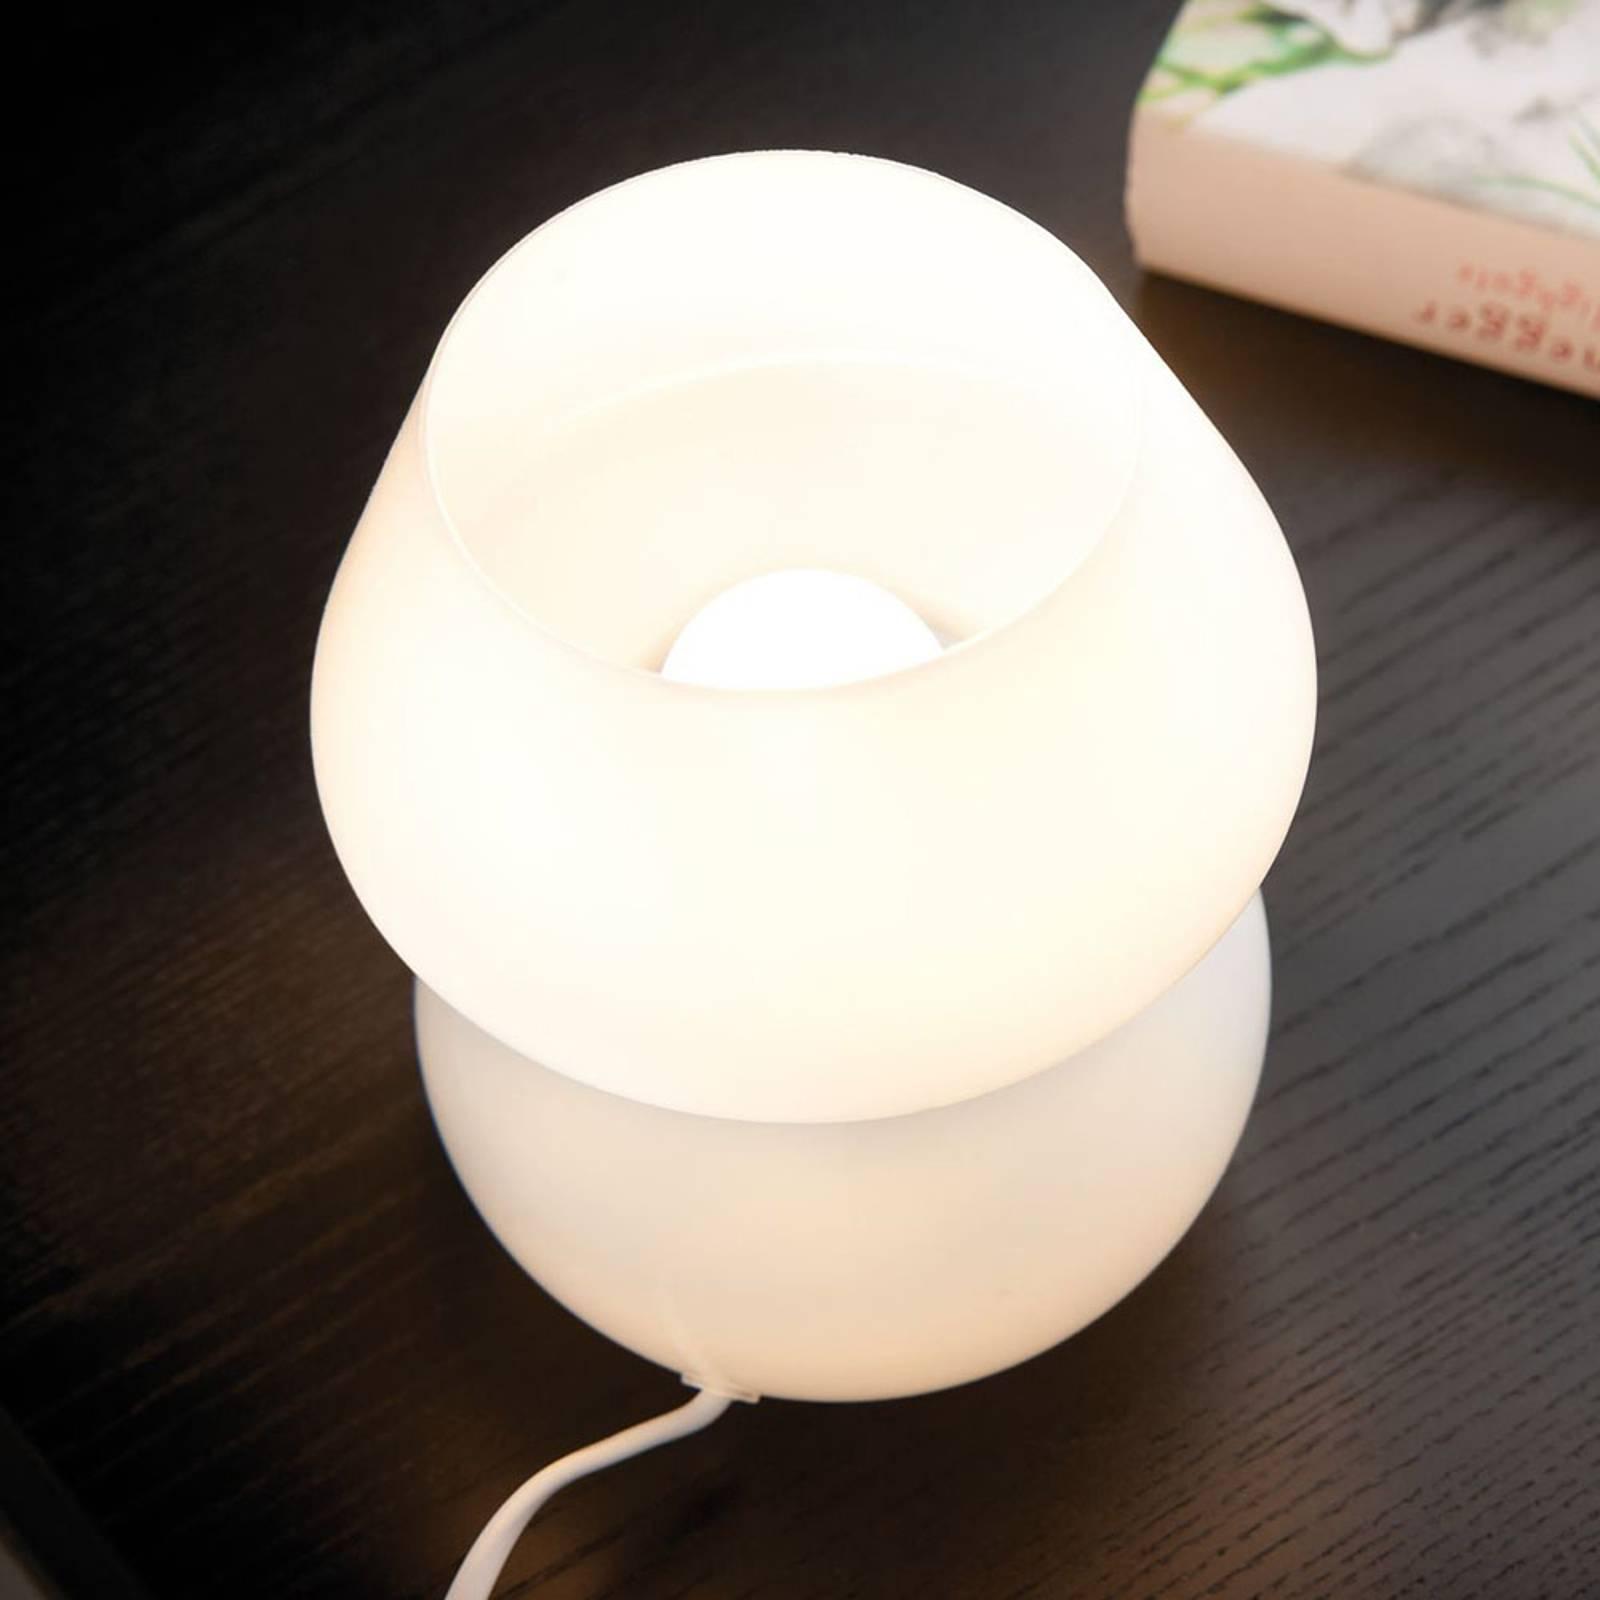 Paulmann-LED-pisaralamppu E27 3,5W 2700K opal 3kpl